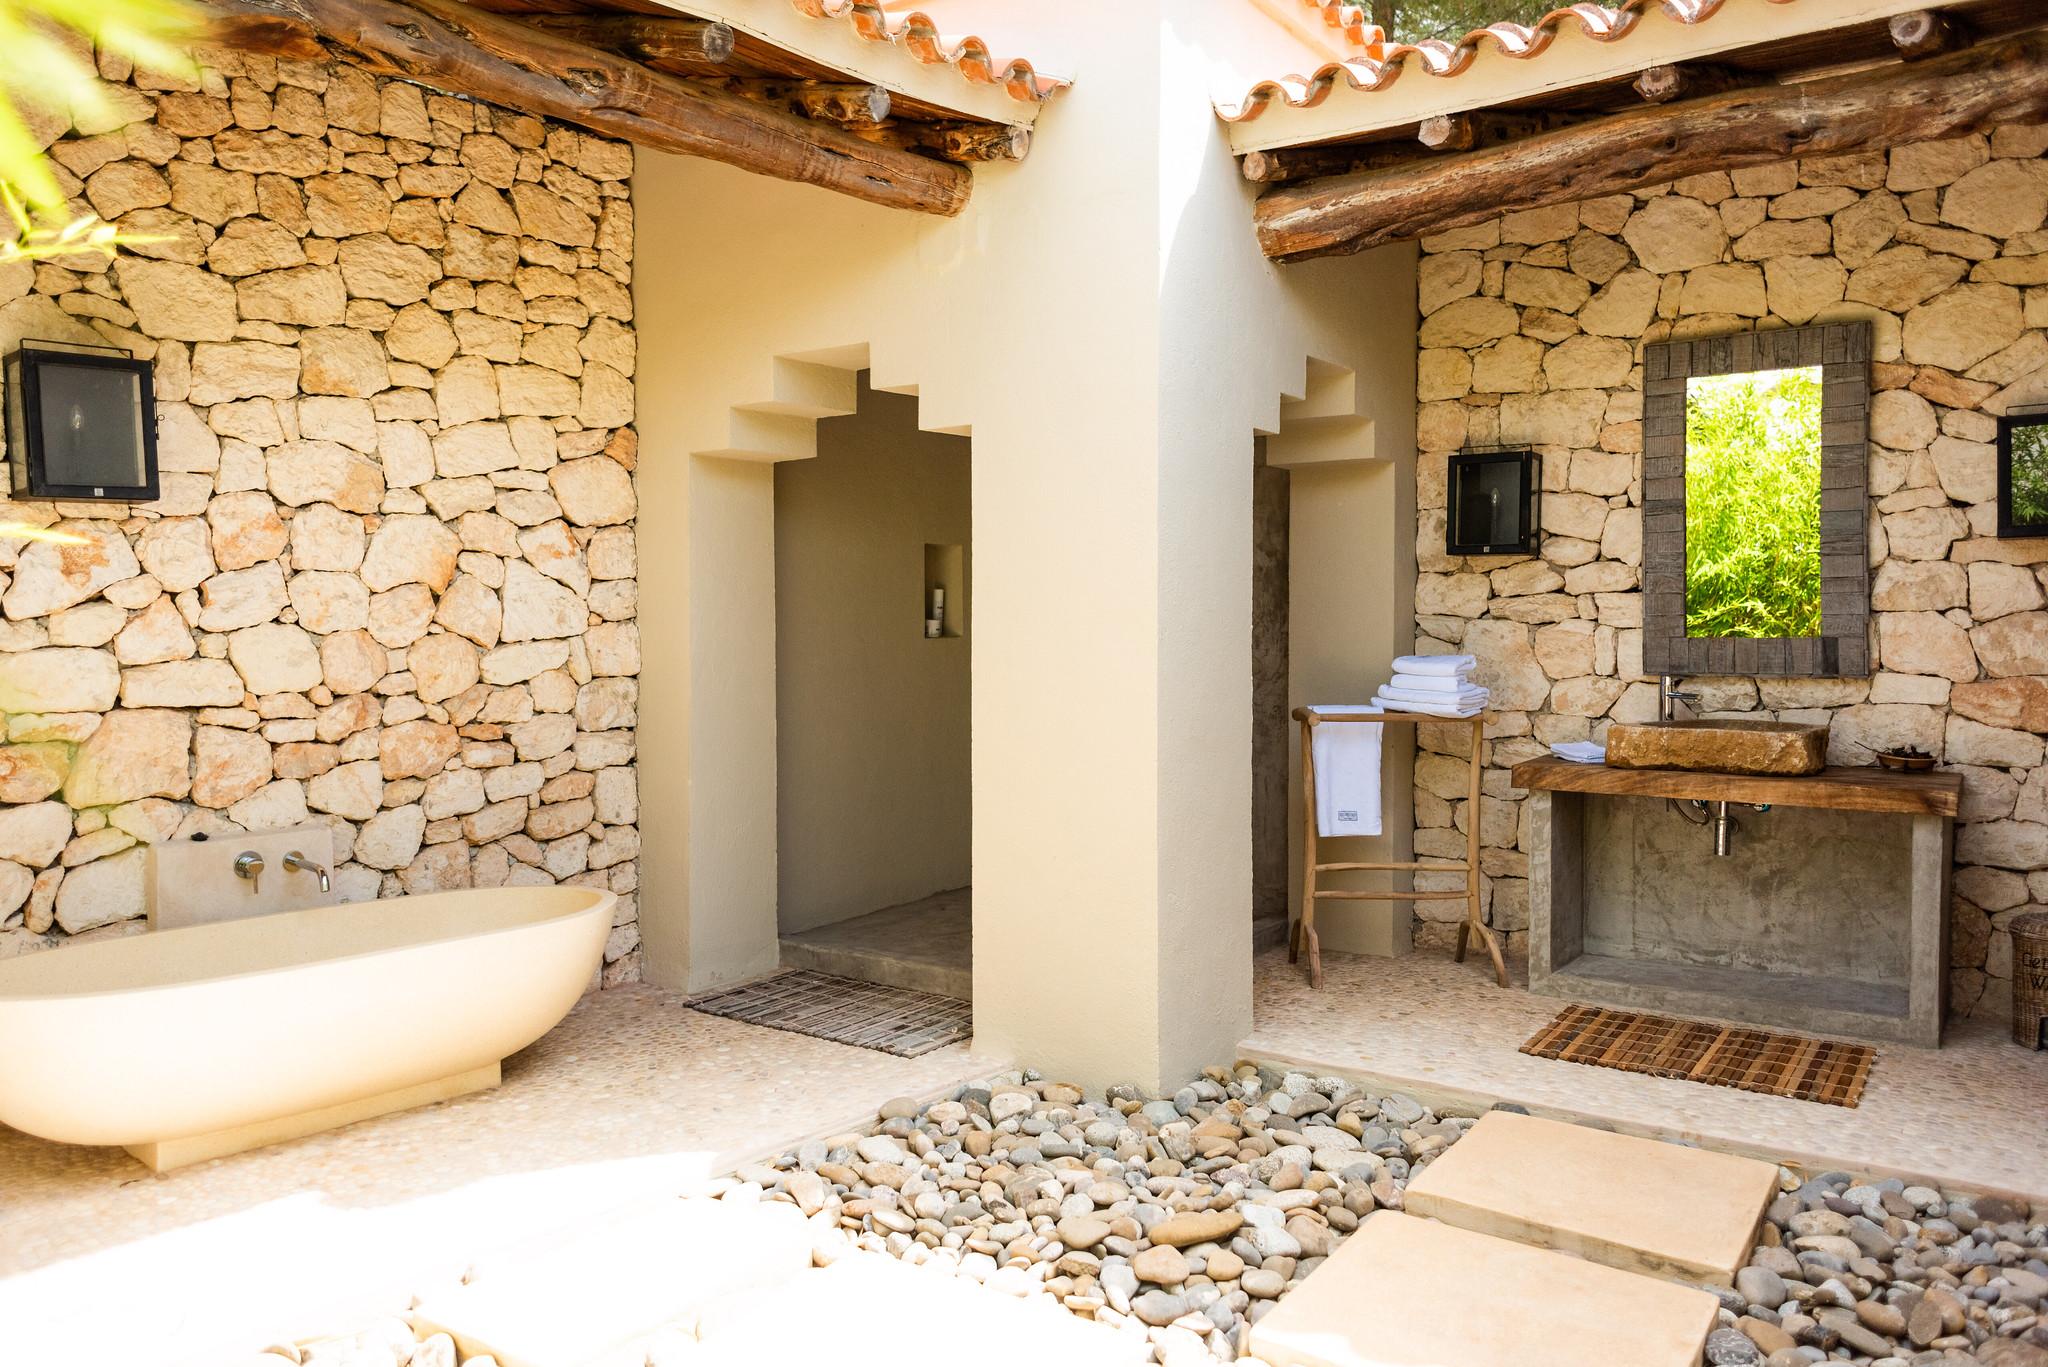 https://www.white-ibiza.com/wp-content/uploads/2020/05/white-ibiza-villas-can-riviere-exterior-outside-bathroom2.jpg